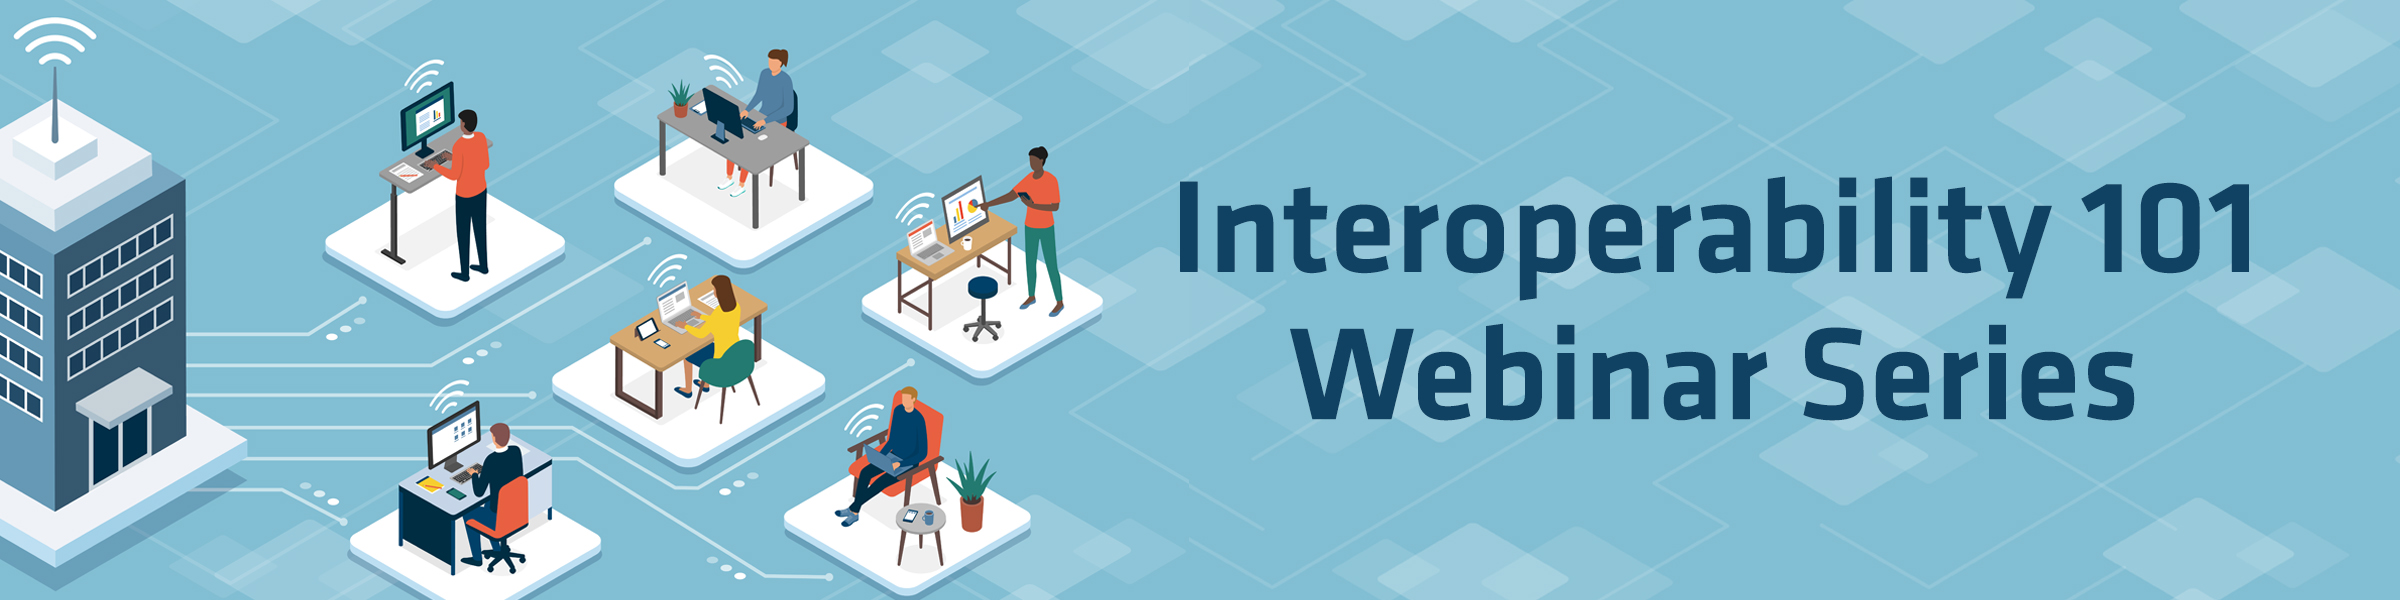 Healthcare Interoperability Webinar Email-Landing-Large